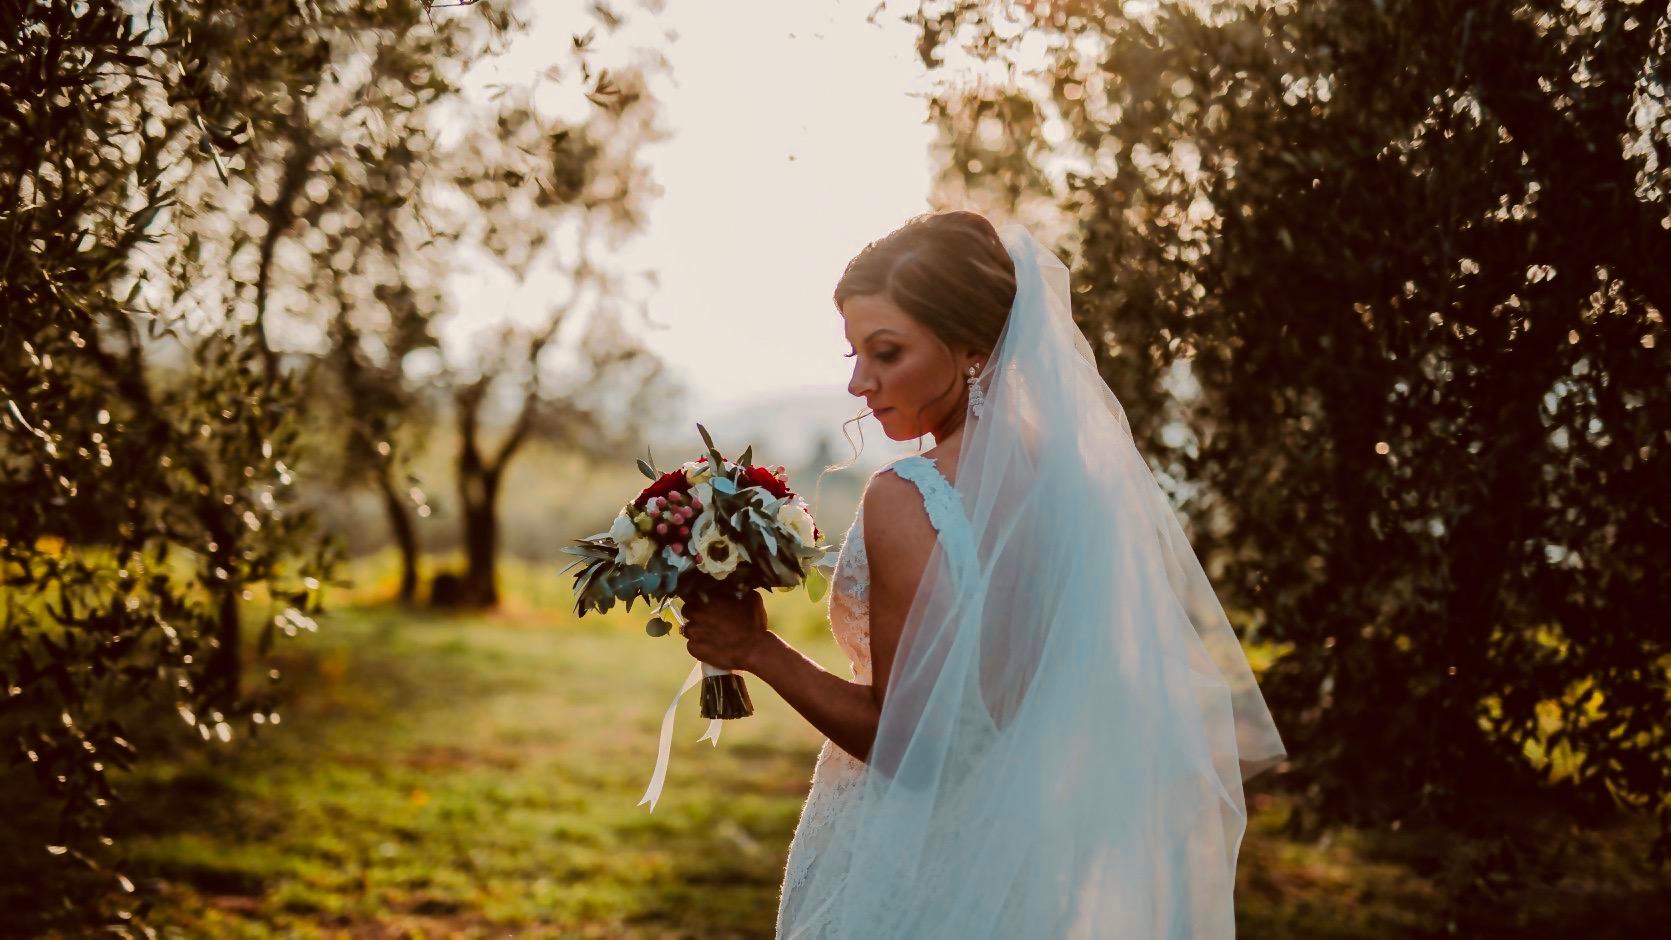 Matrimoni-firenze